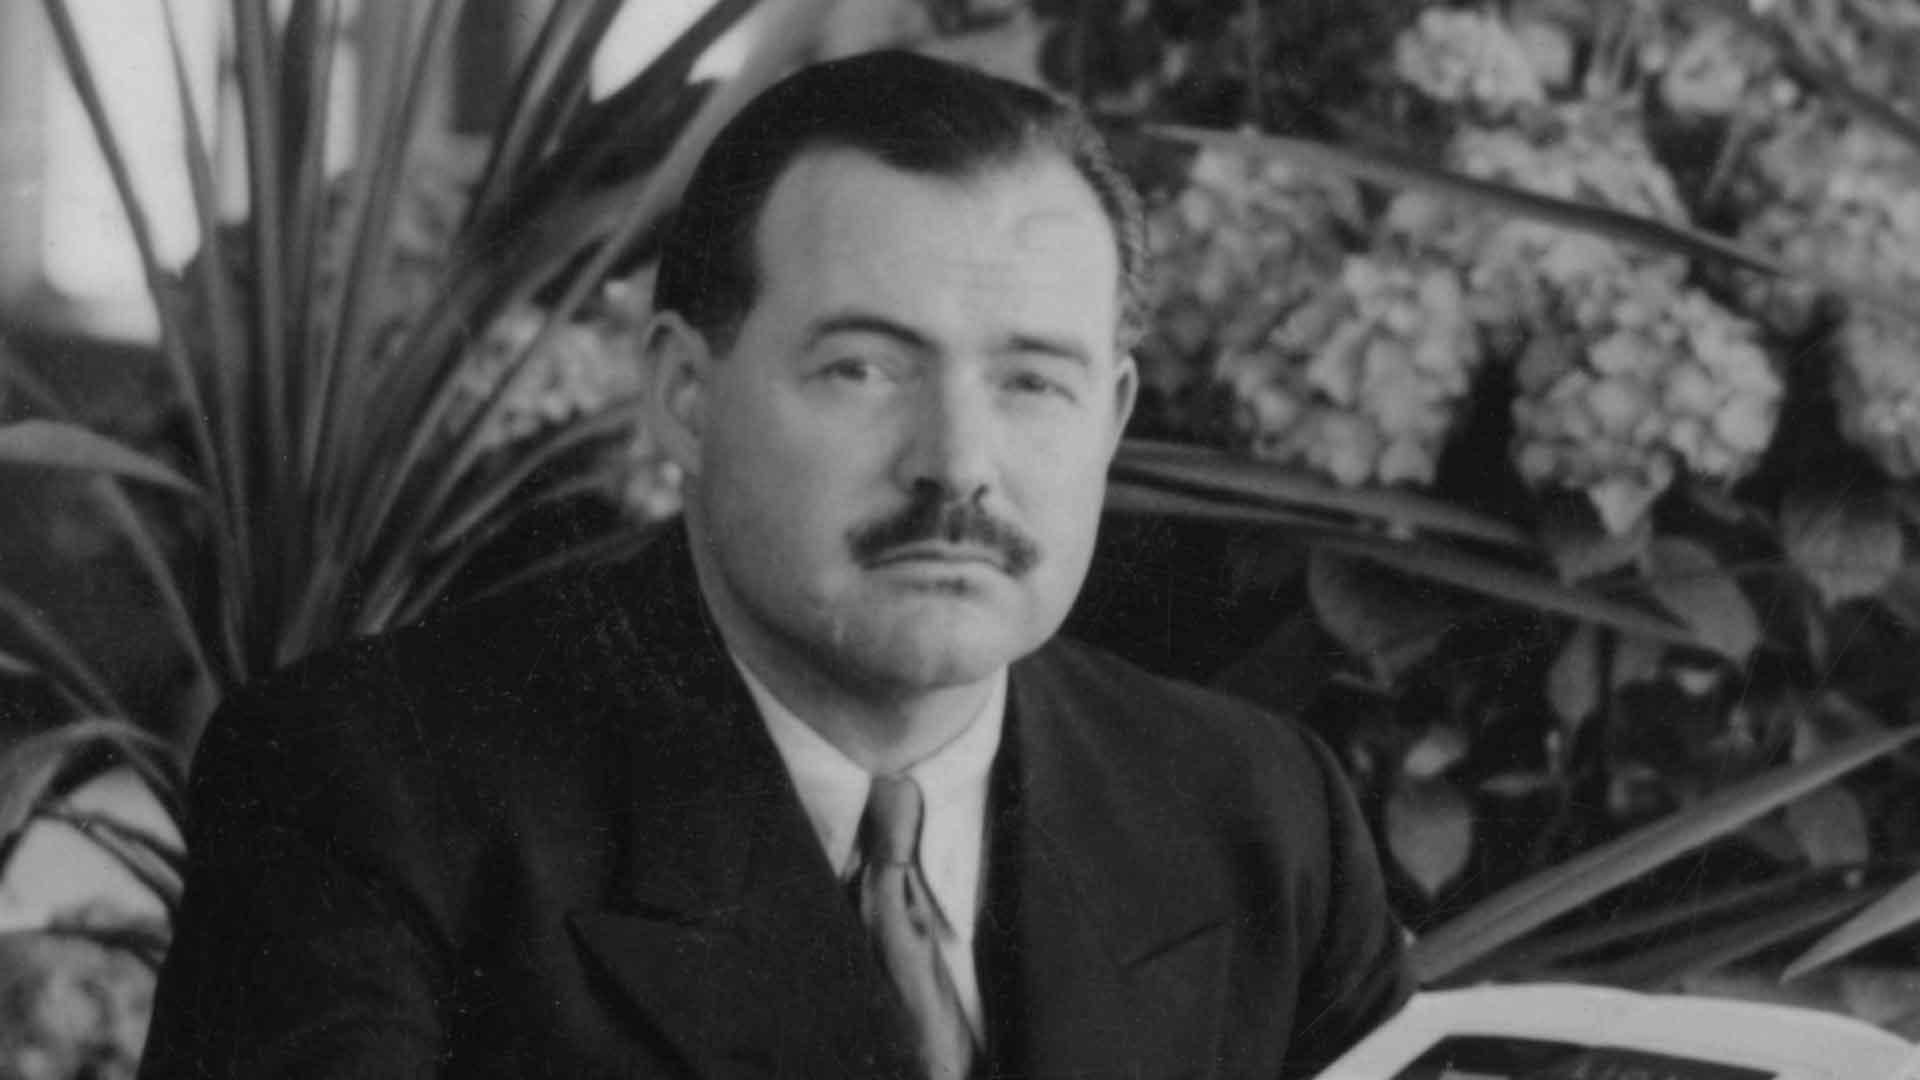 Hemingway - A Look Ahead